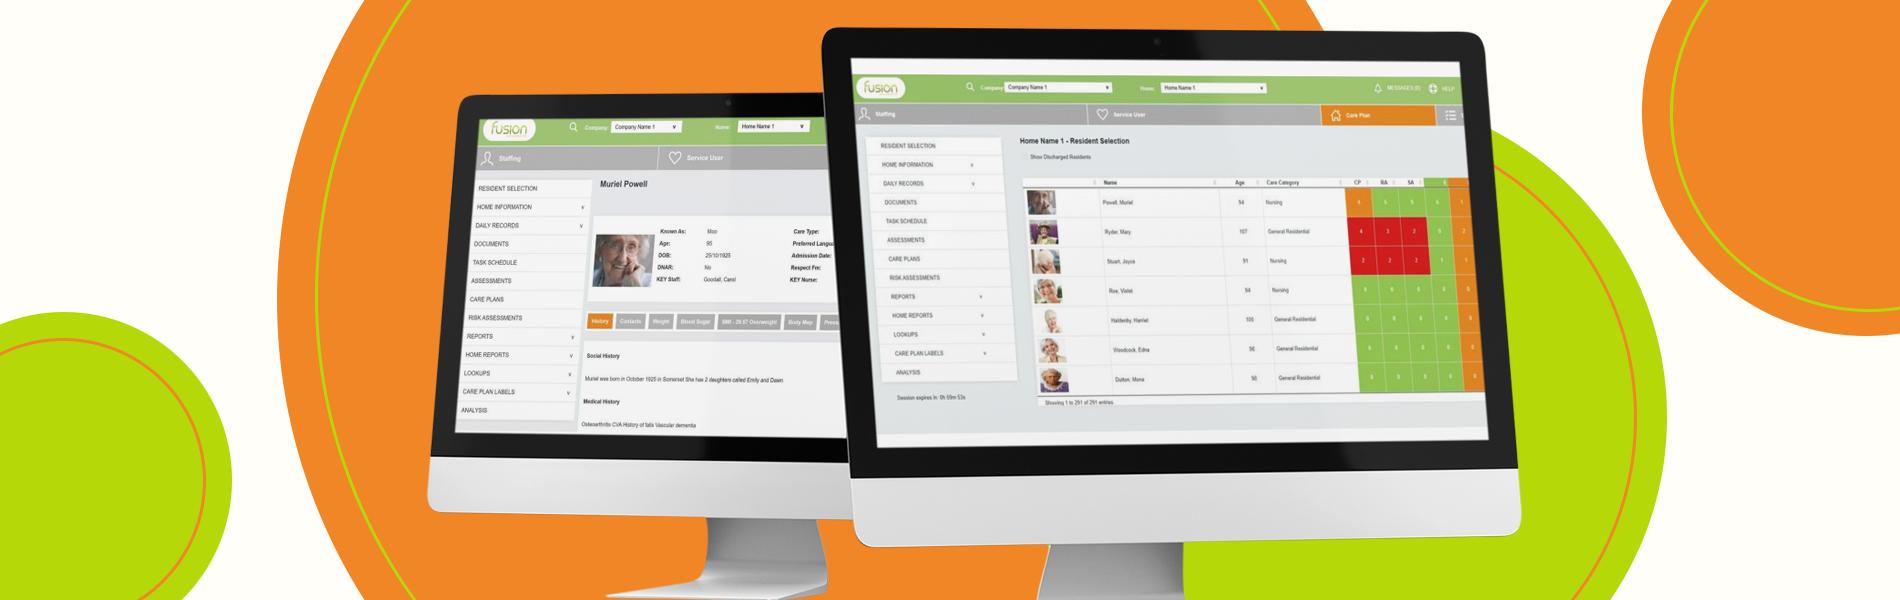 Care Management Software - Fusion